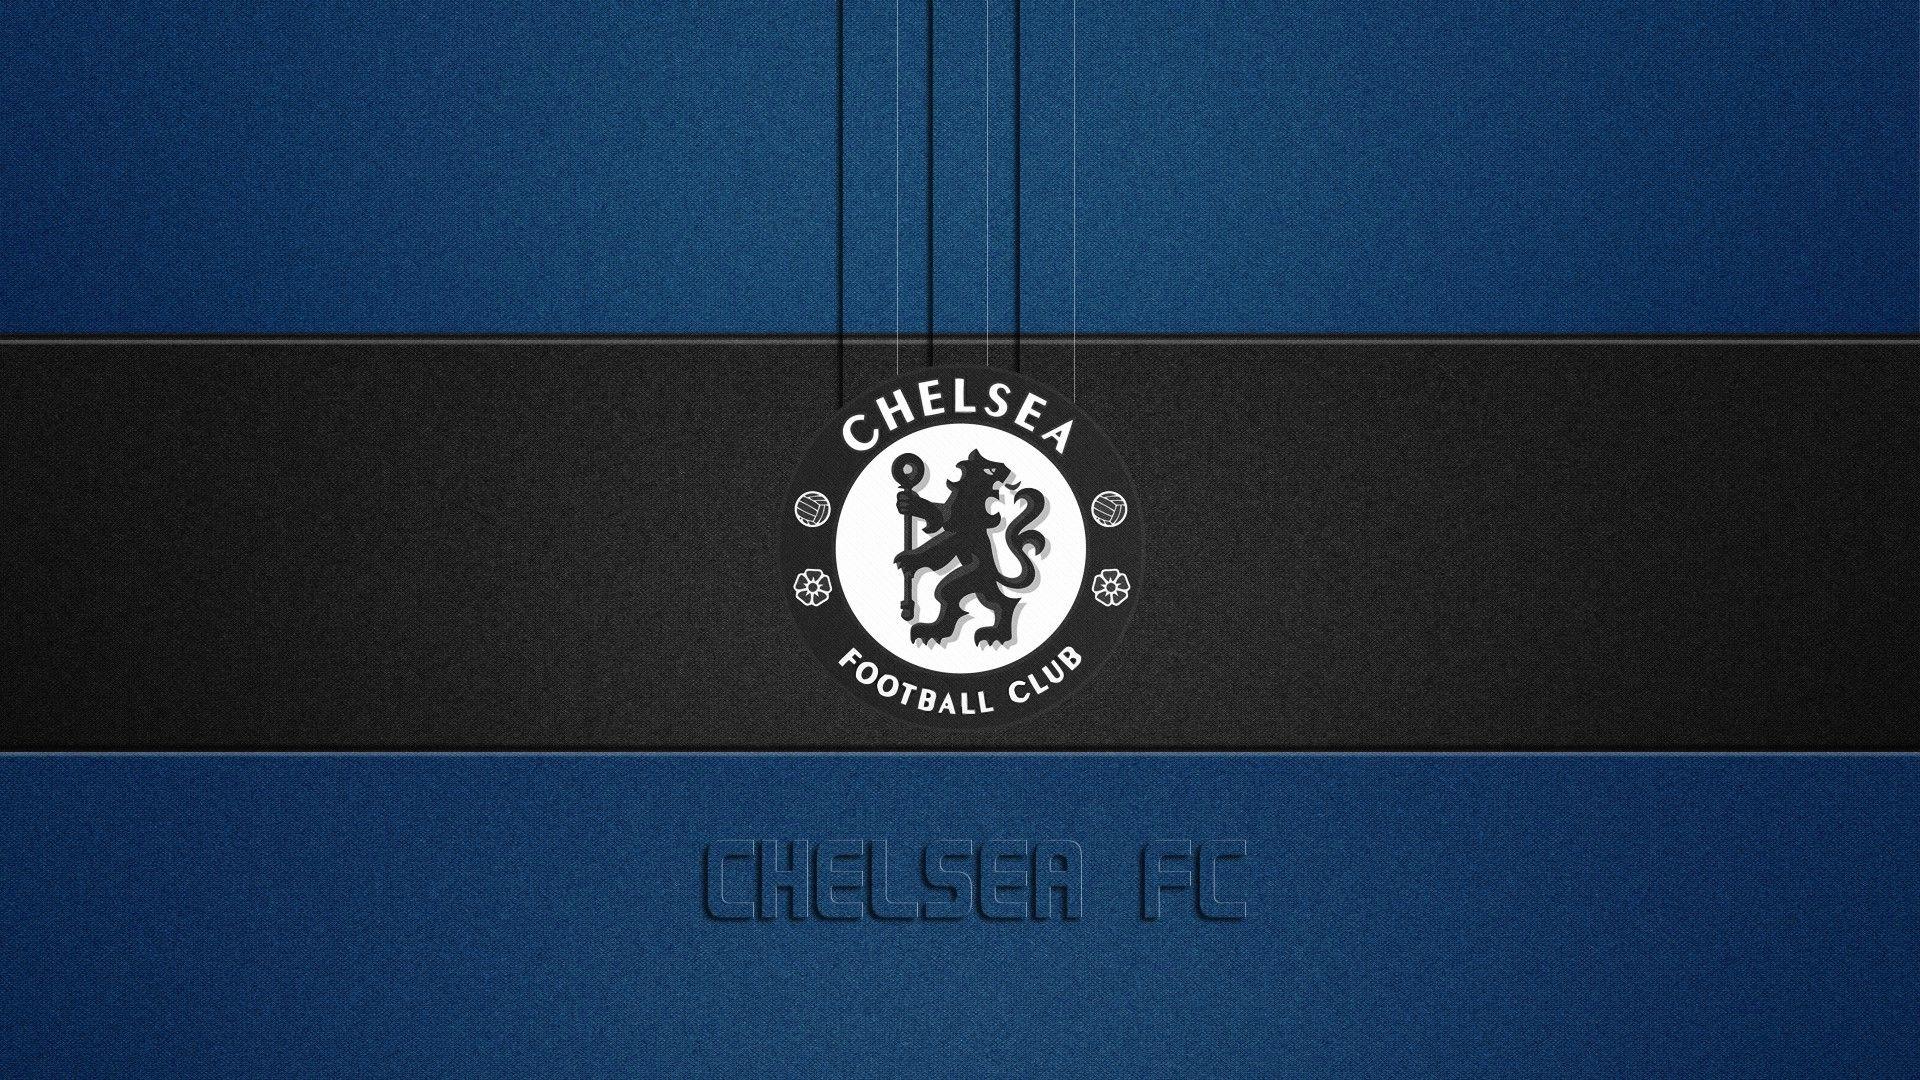 Hd Wallpaper Football Free